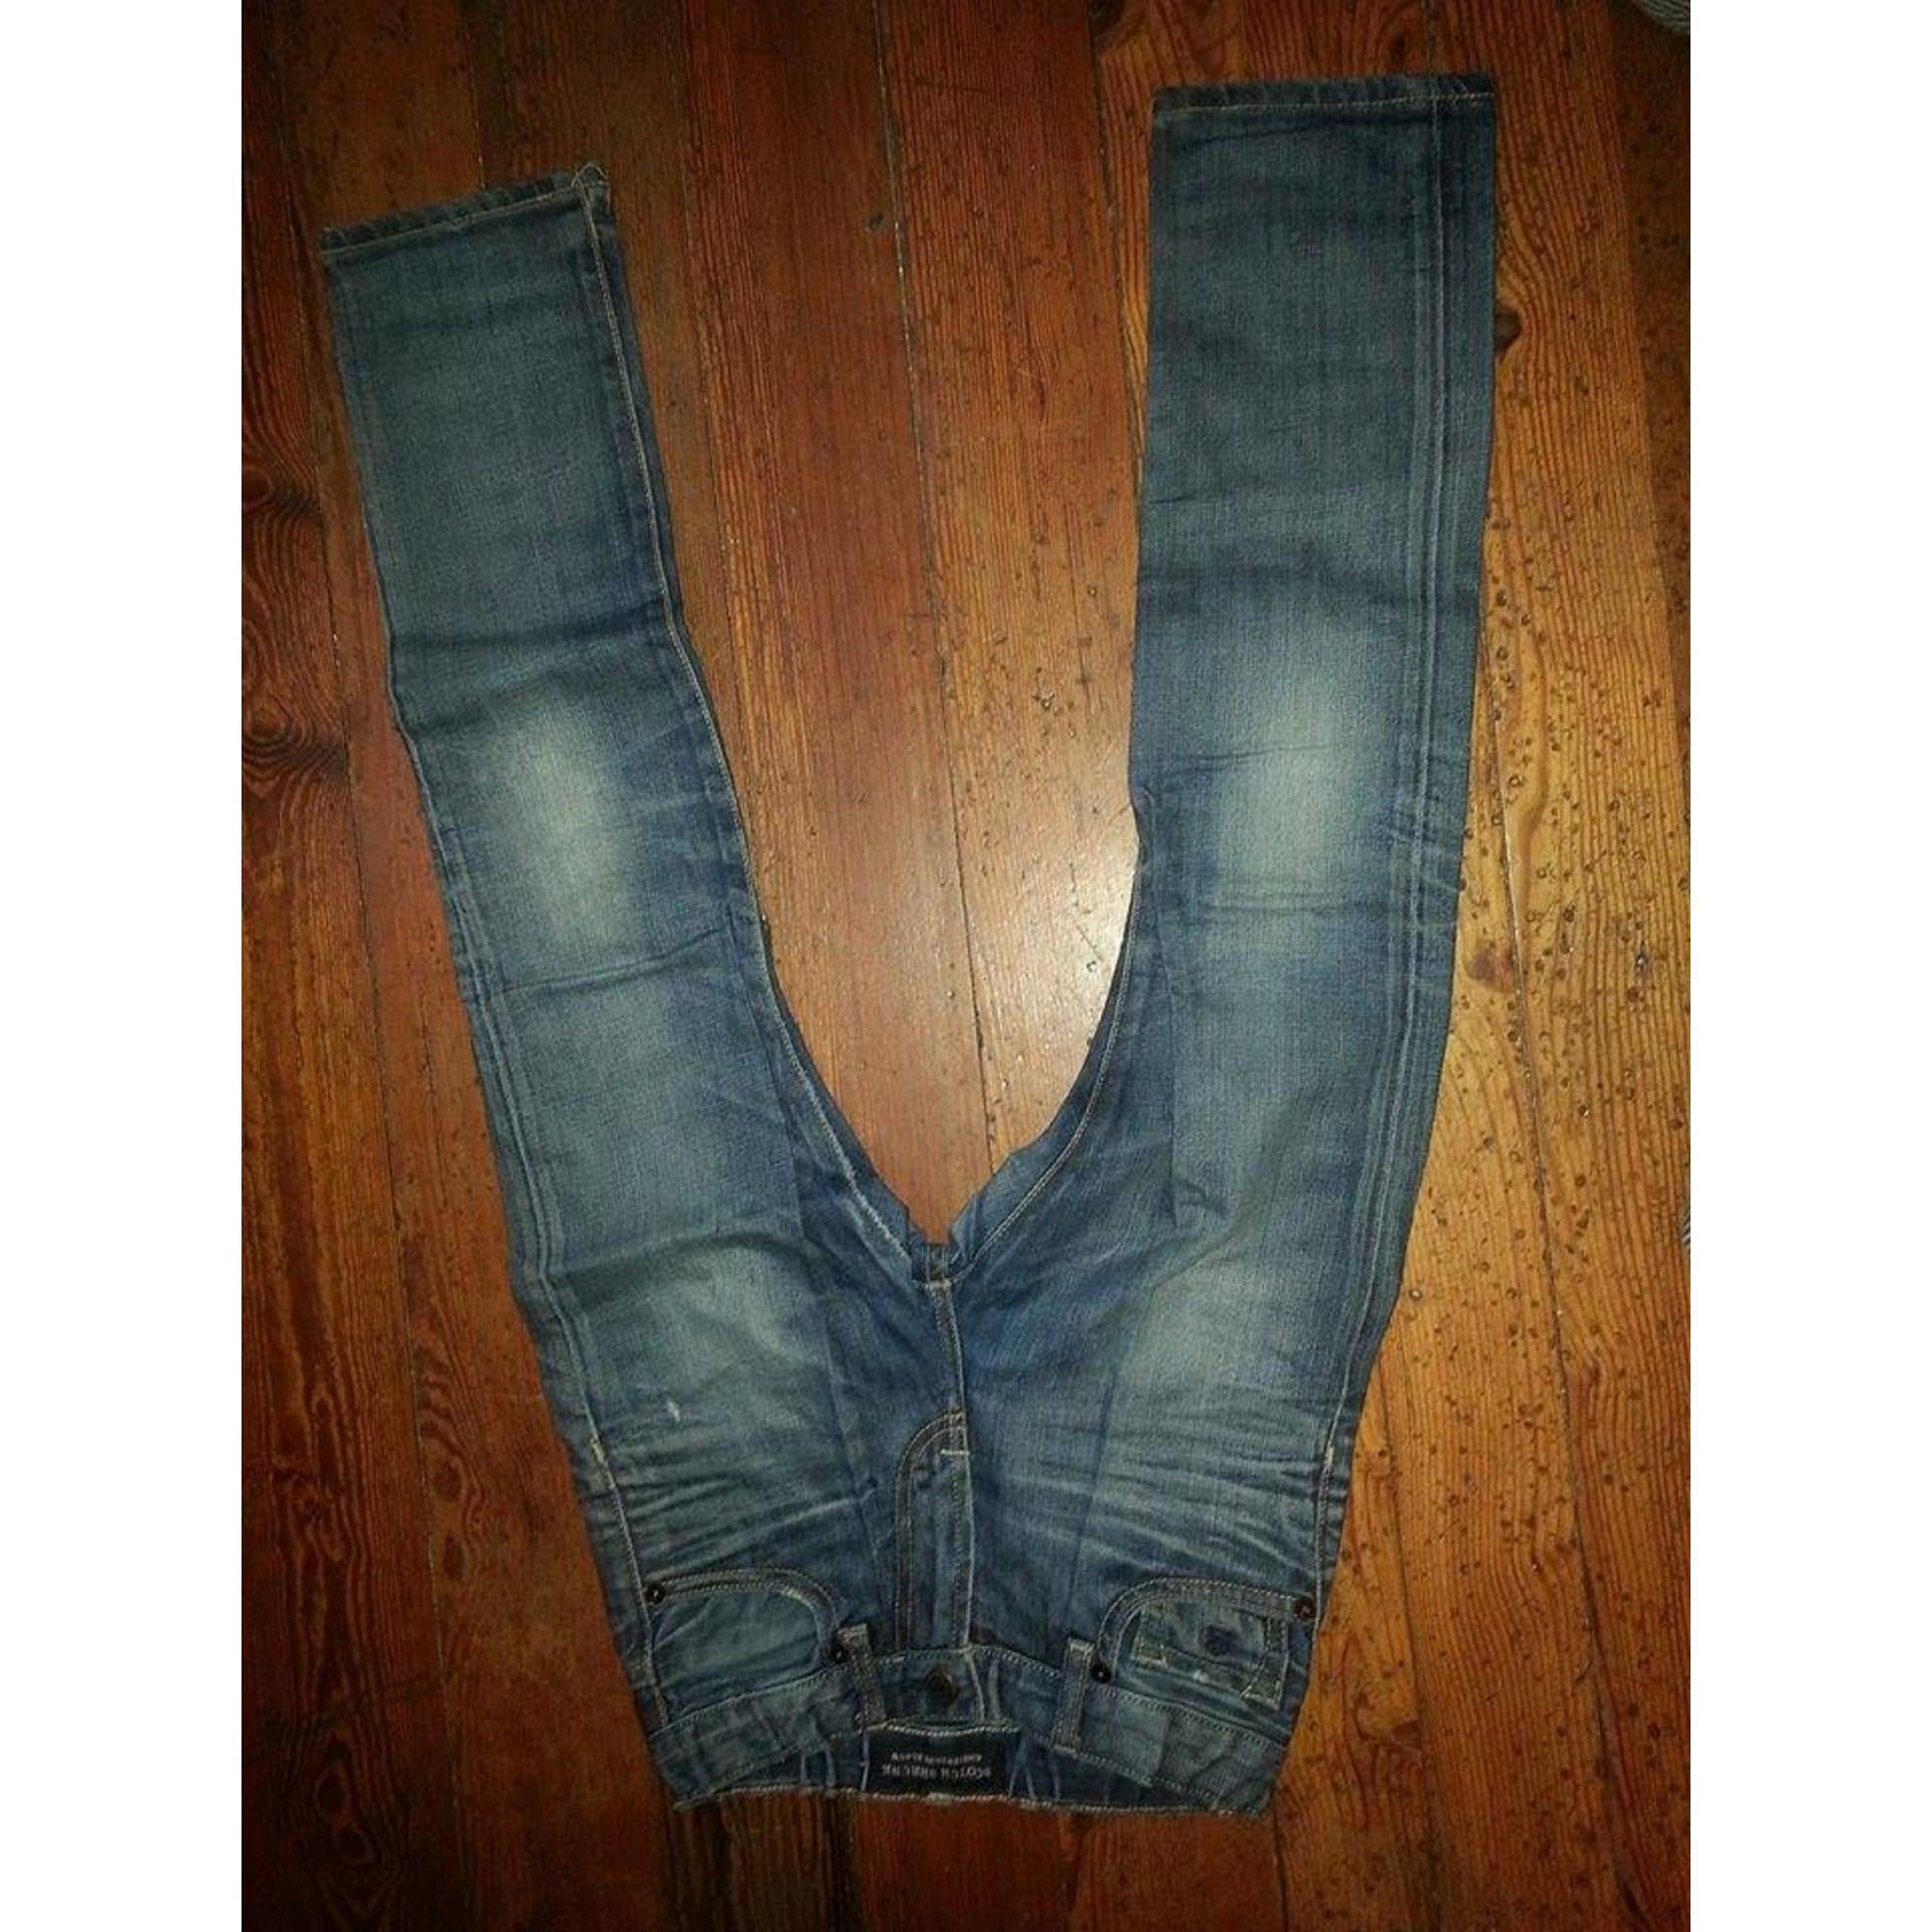 Jeans droit SCOTCH SHRUNK Bleu, bleu marine, bleu turquoise